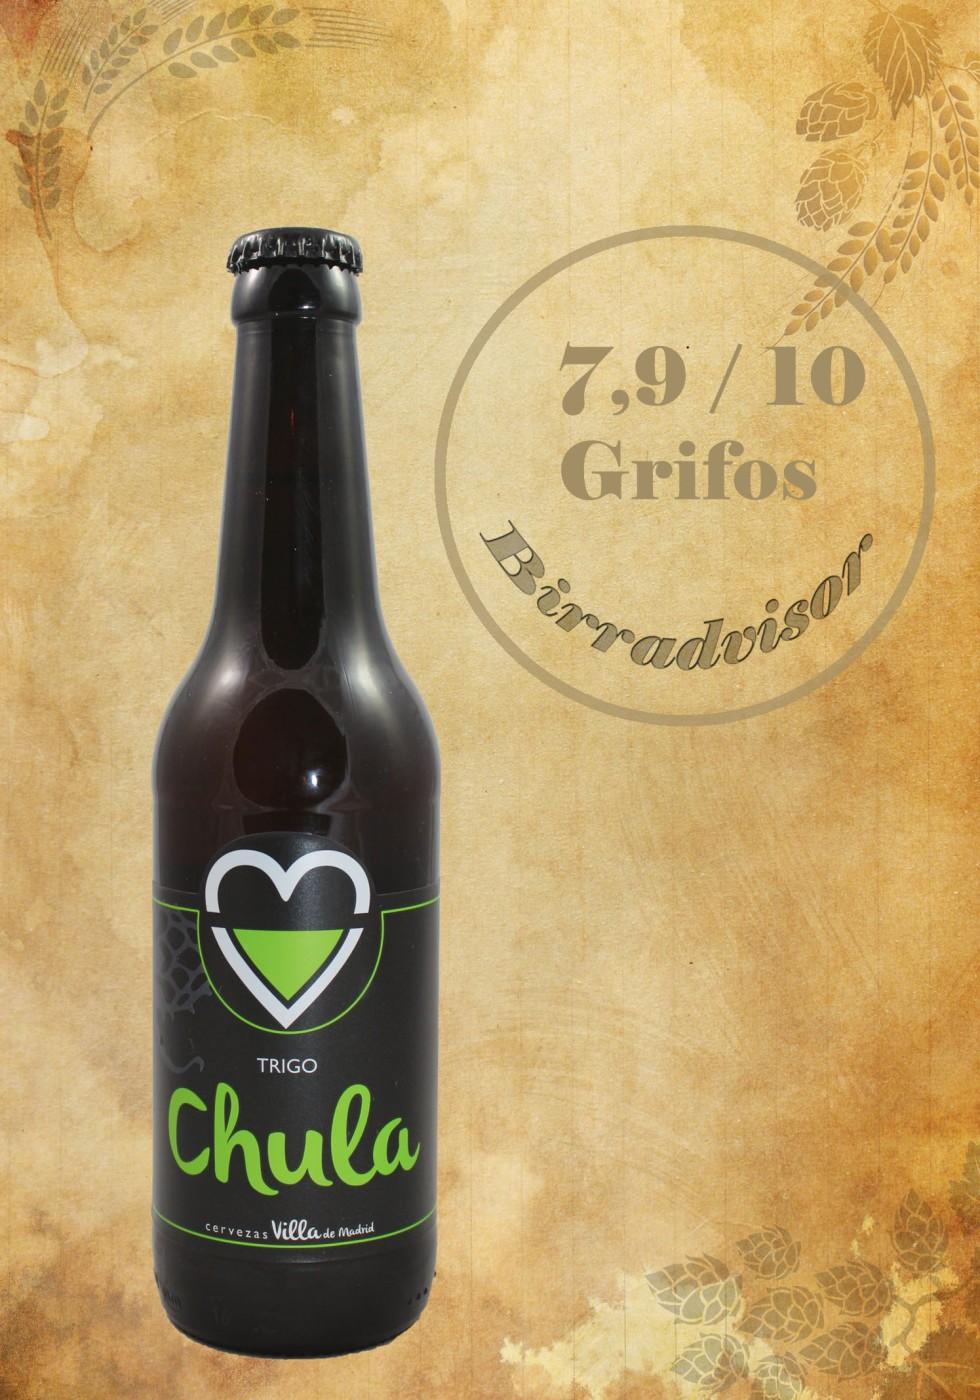 Chula (trigo).jpg